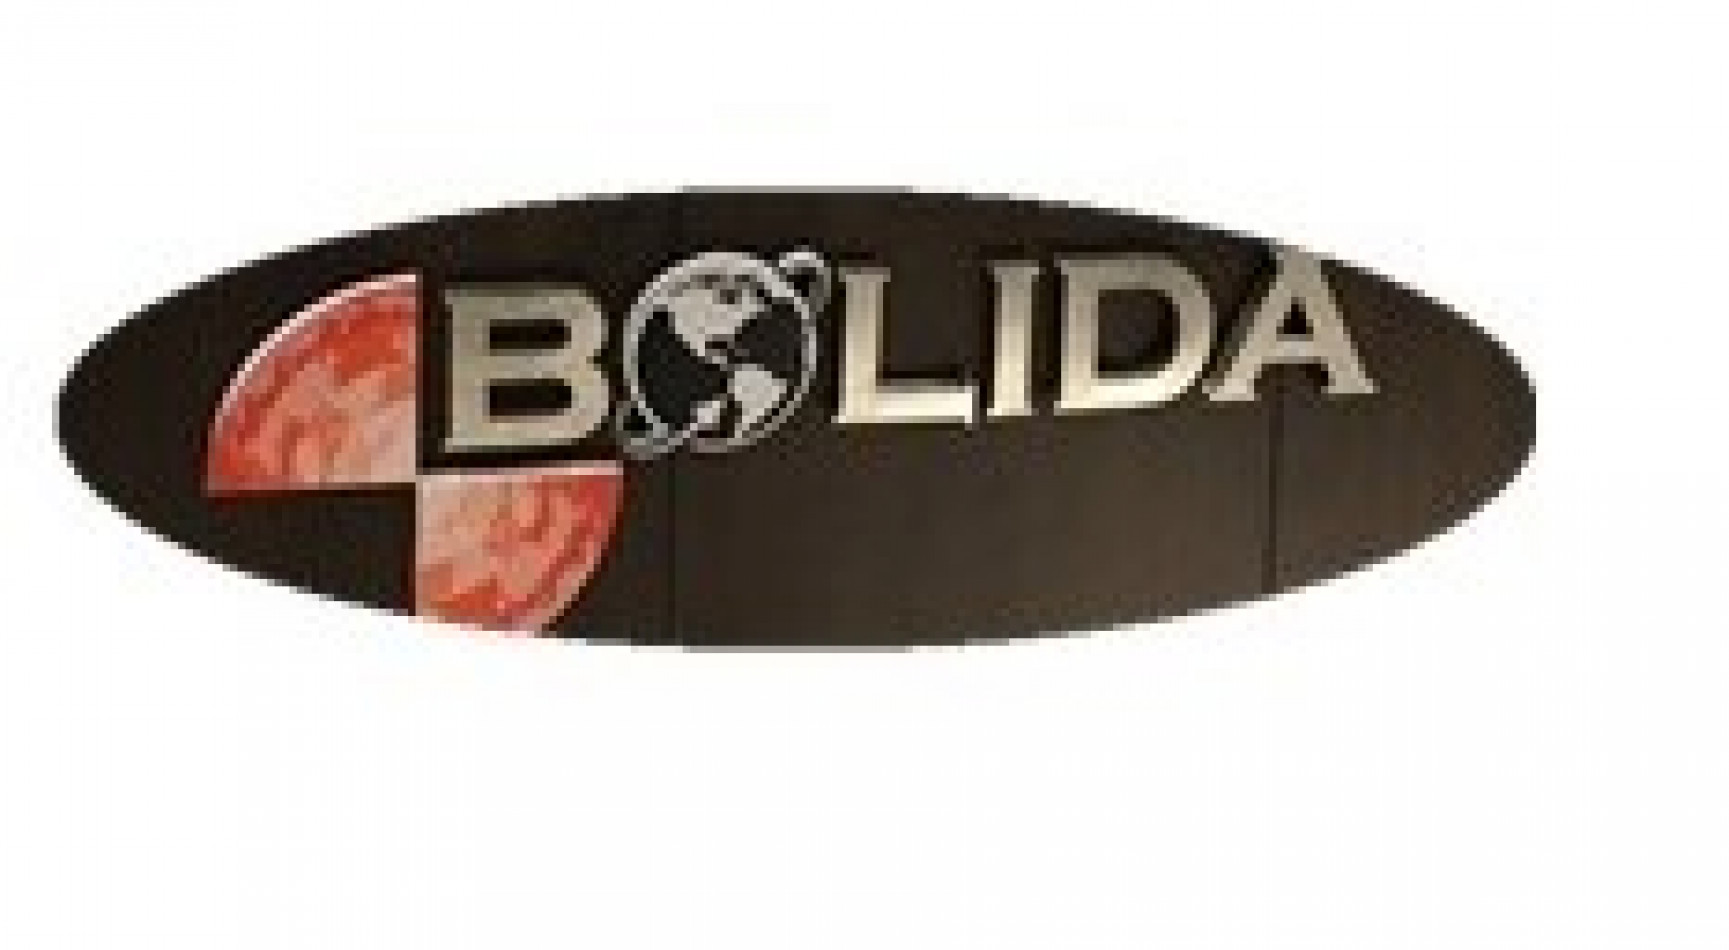 SHAOXING BOLIDA IMP & EXP CO., LTD.